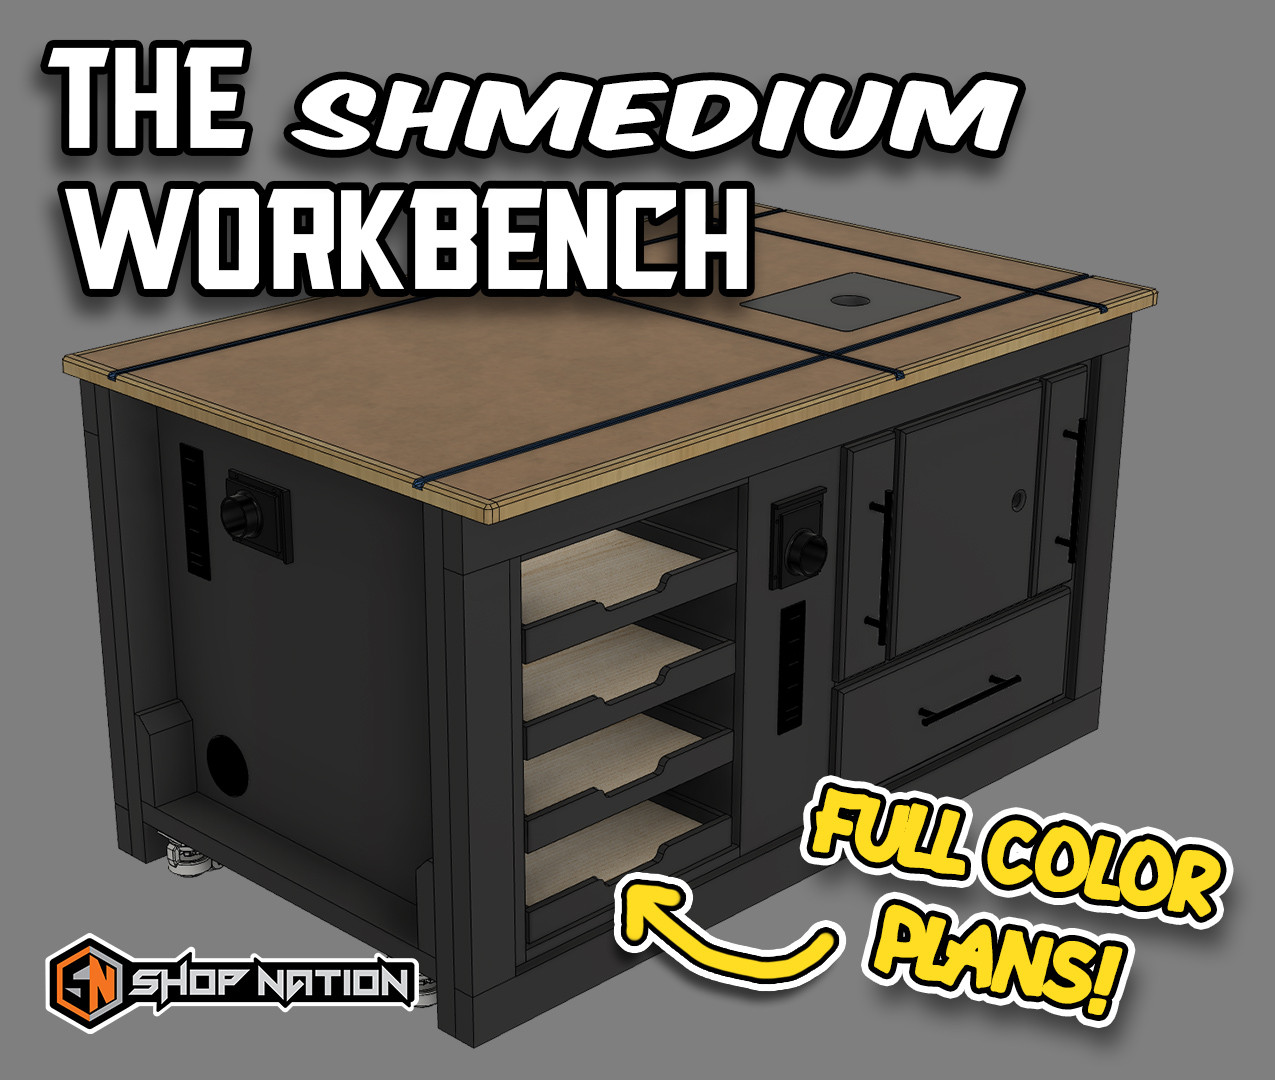 Shmedium Workbench etsy cover copy.jpg